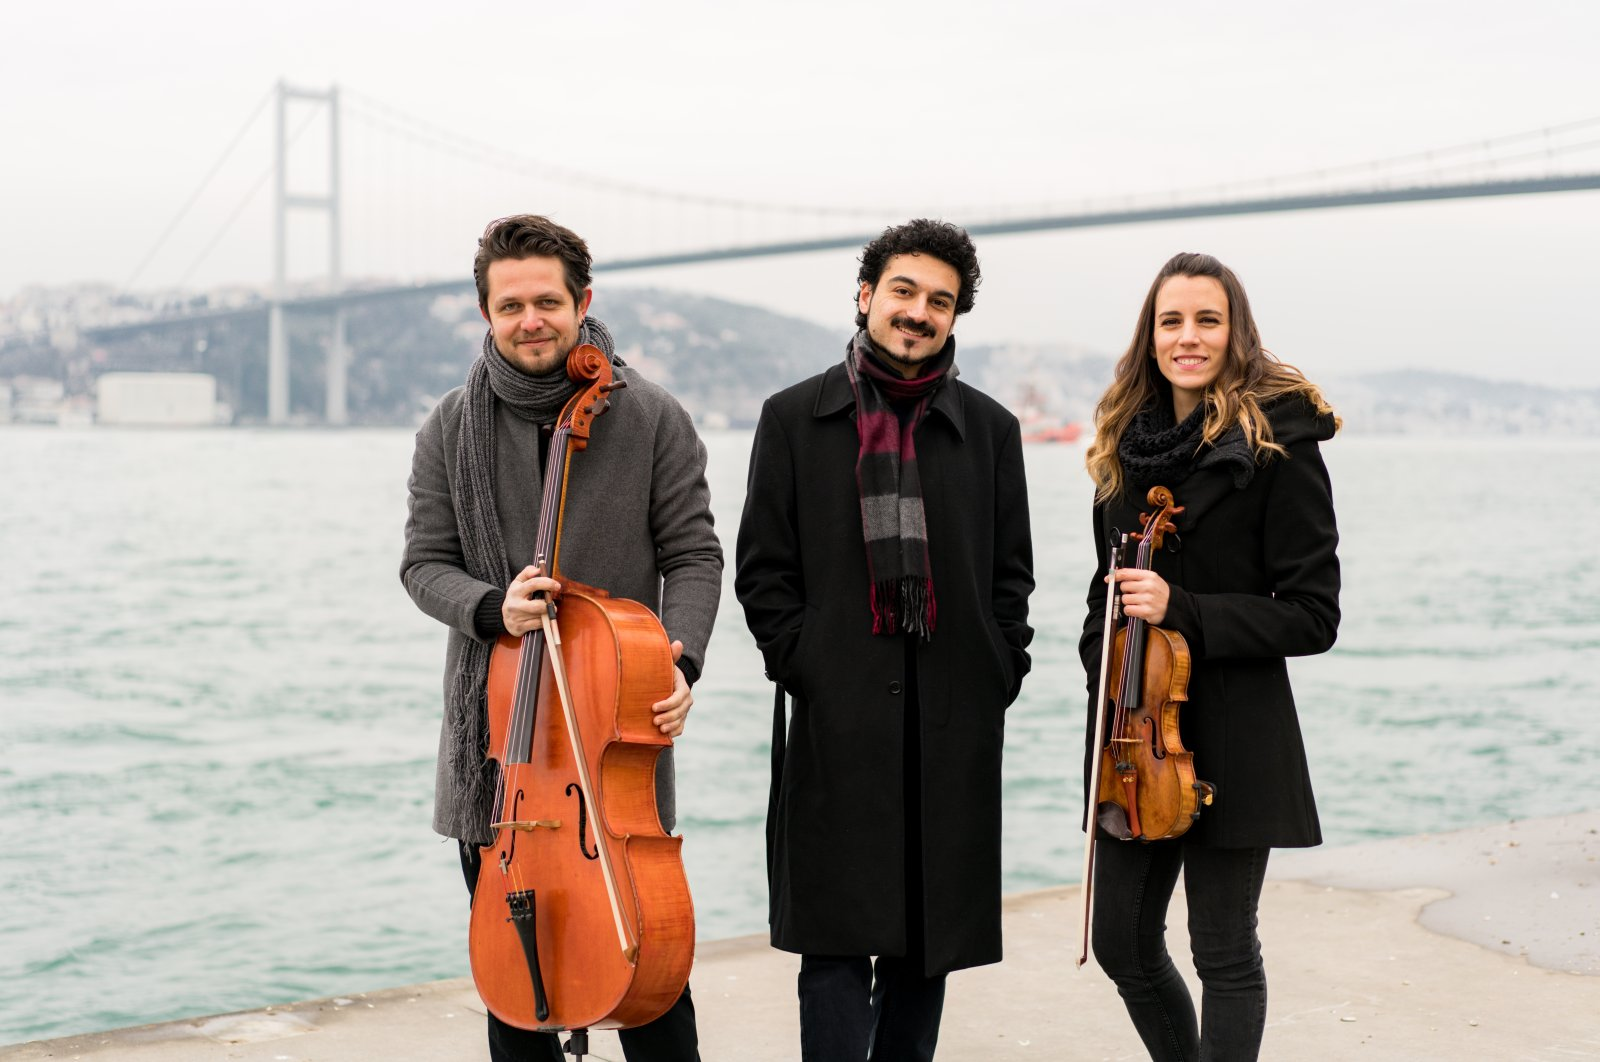 Çağlayan Çetin (L), Özgür Ünaldı (M) and Özgecan Günöz (R) pose in front of the Bosporus Bridge, Istanbul in this photo provided on Aug. 4, 2020.